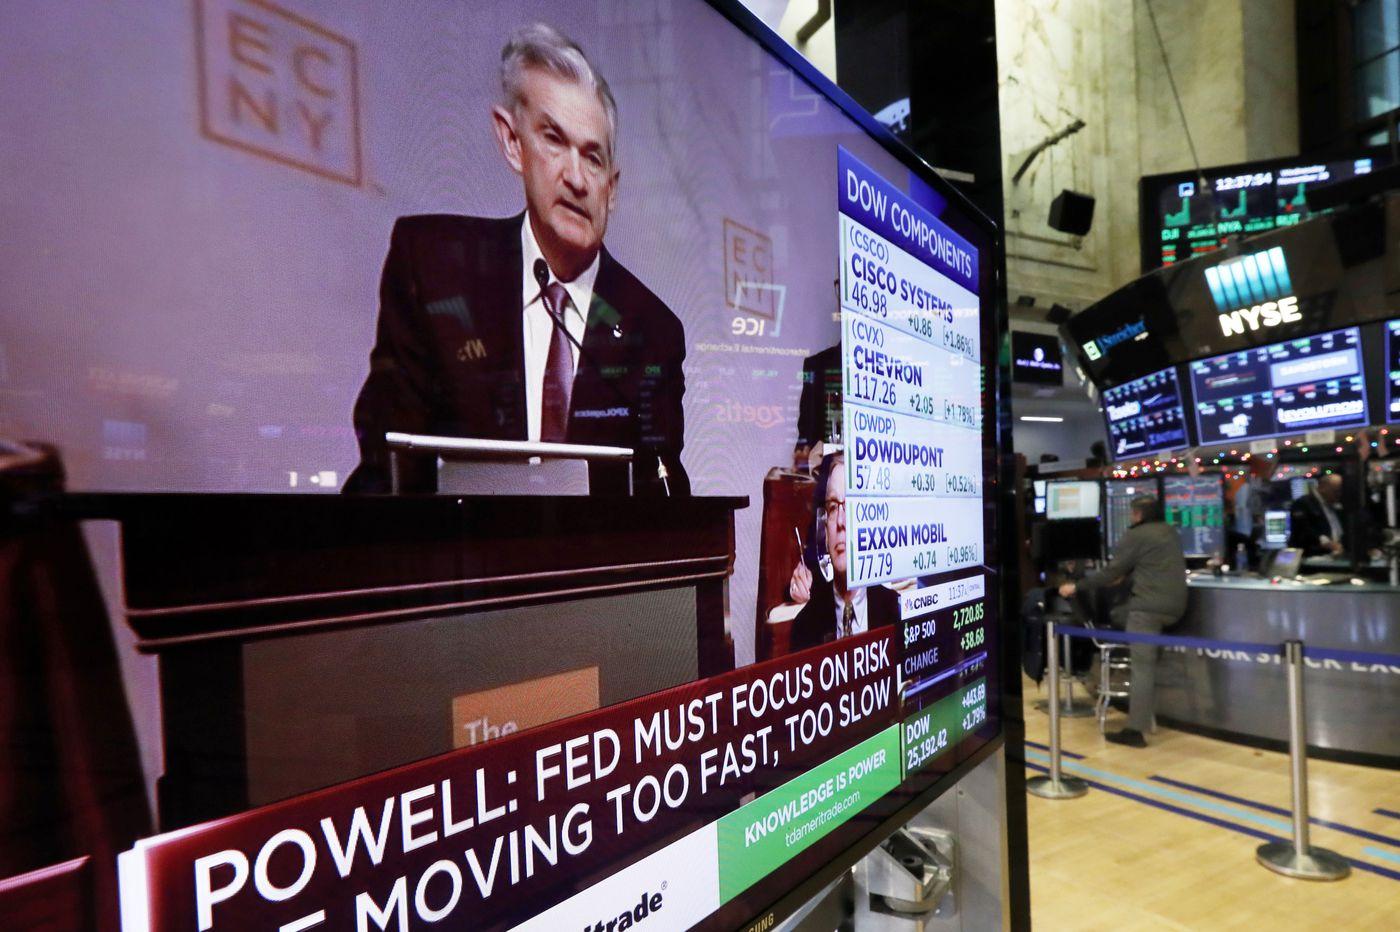 High earners complicate Powell's job   Opinion